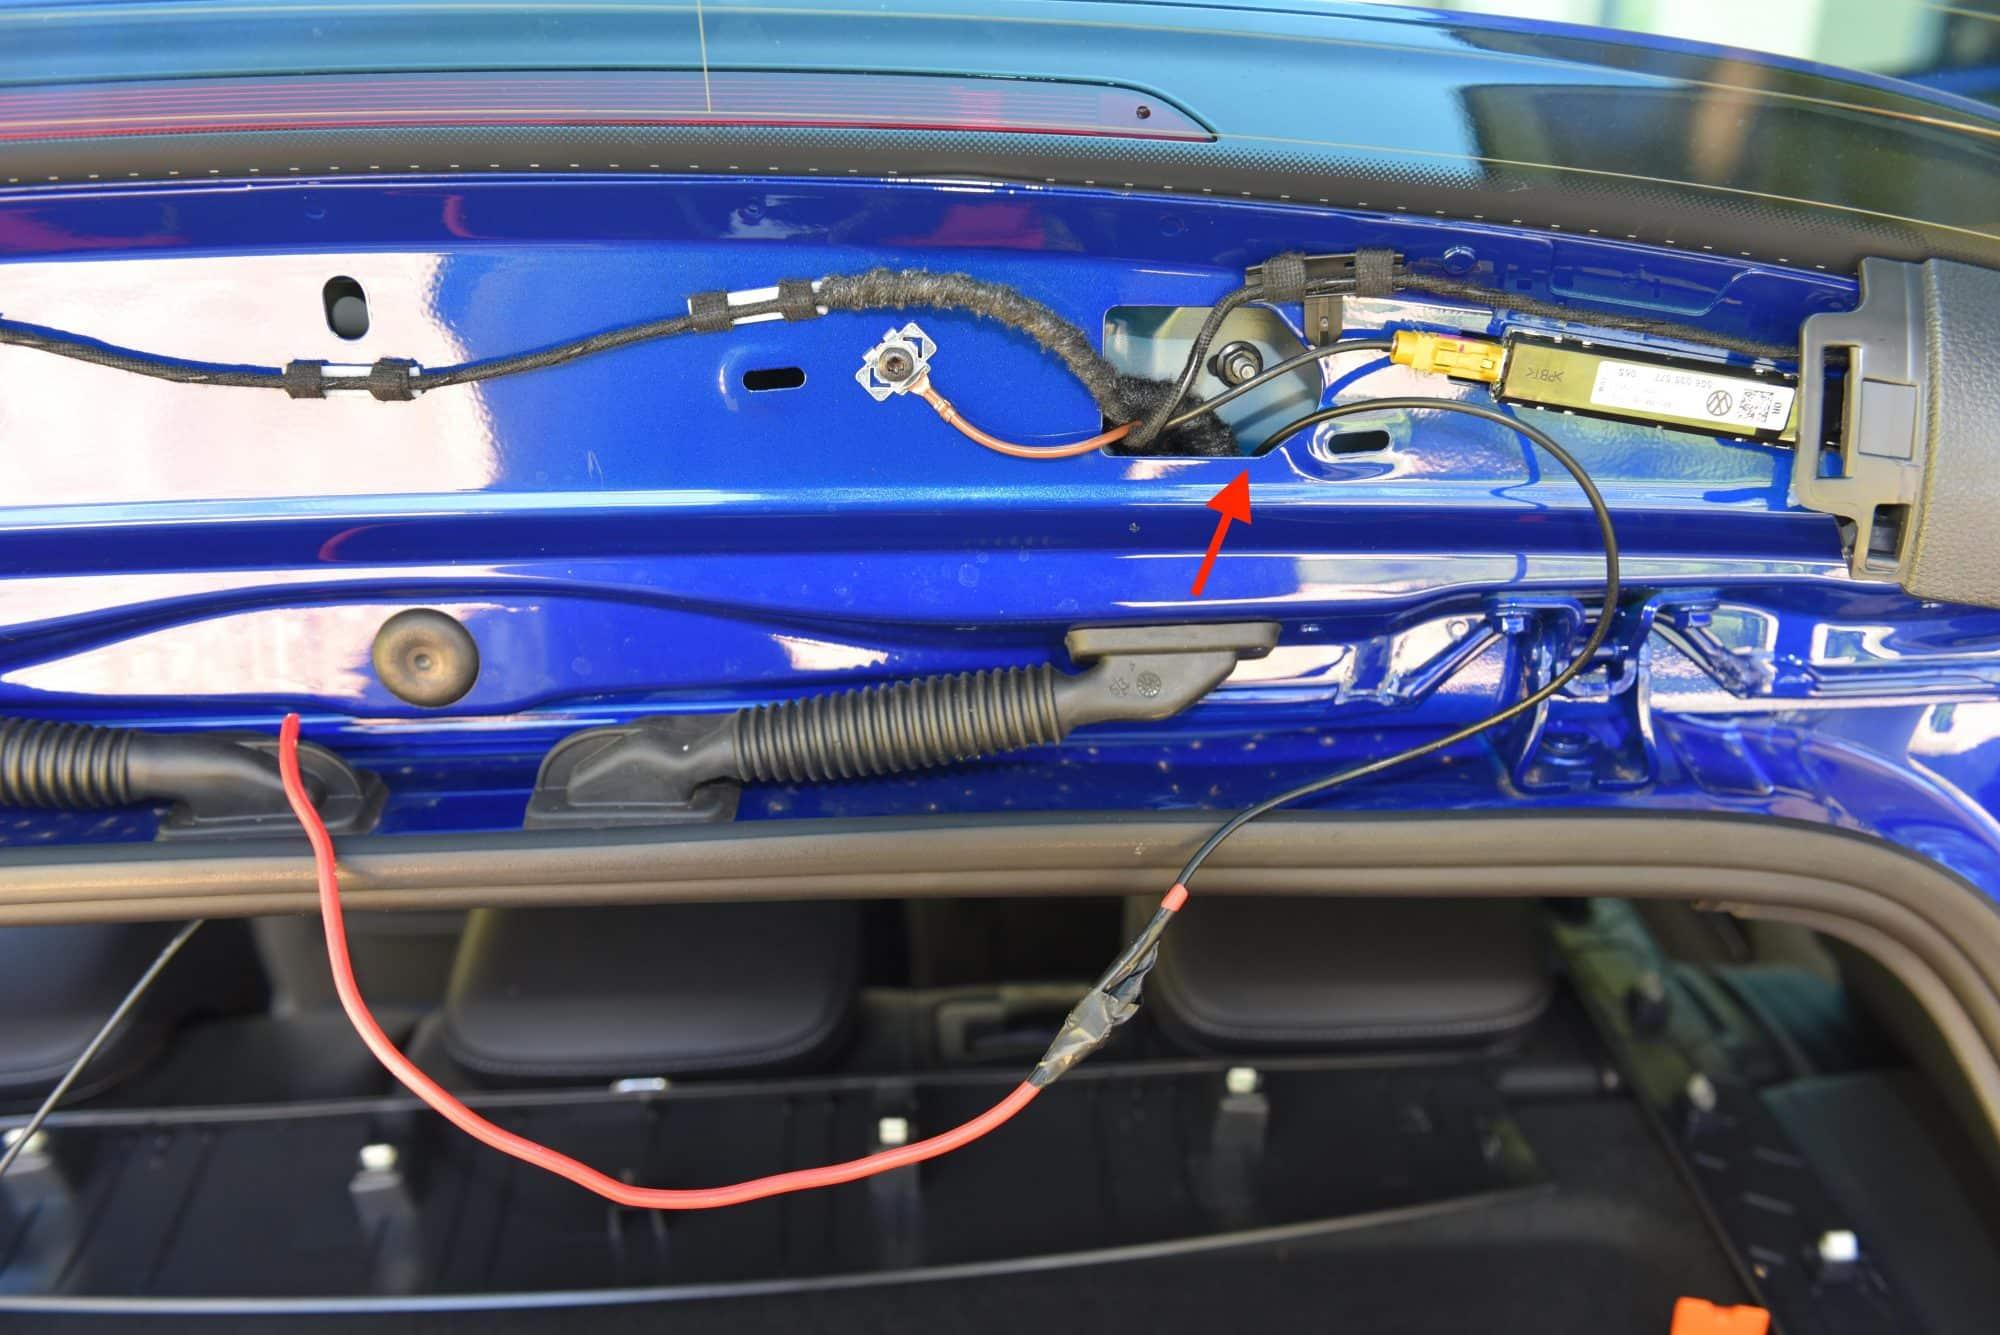 MK7 Golf Dash Cam Install Blackvue DR650